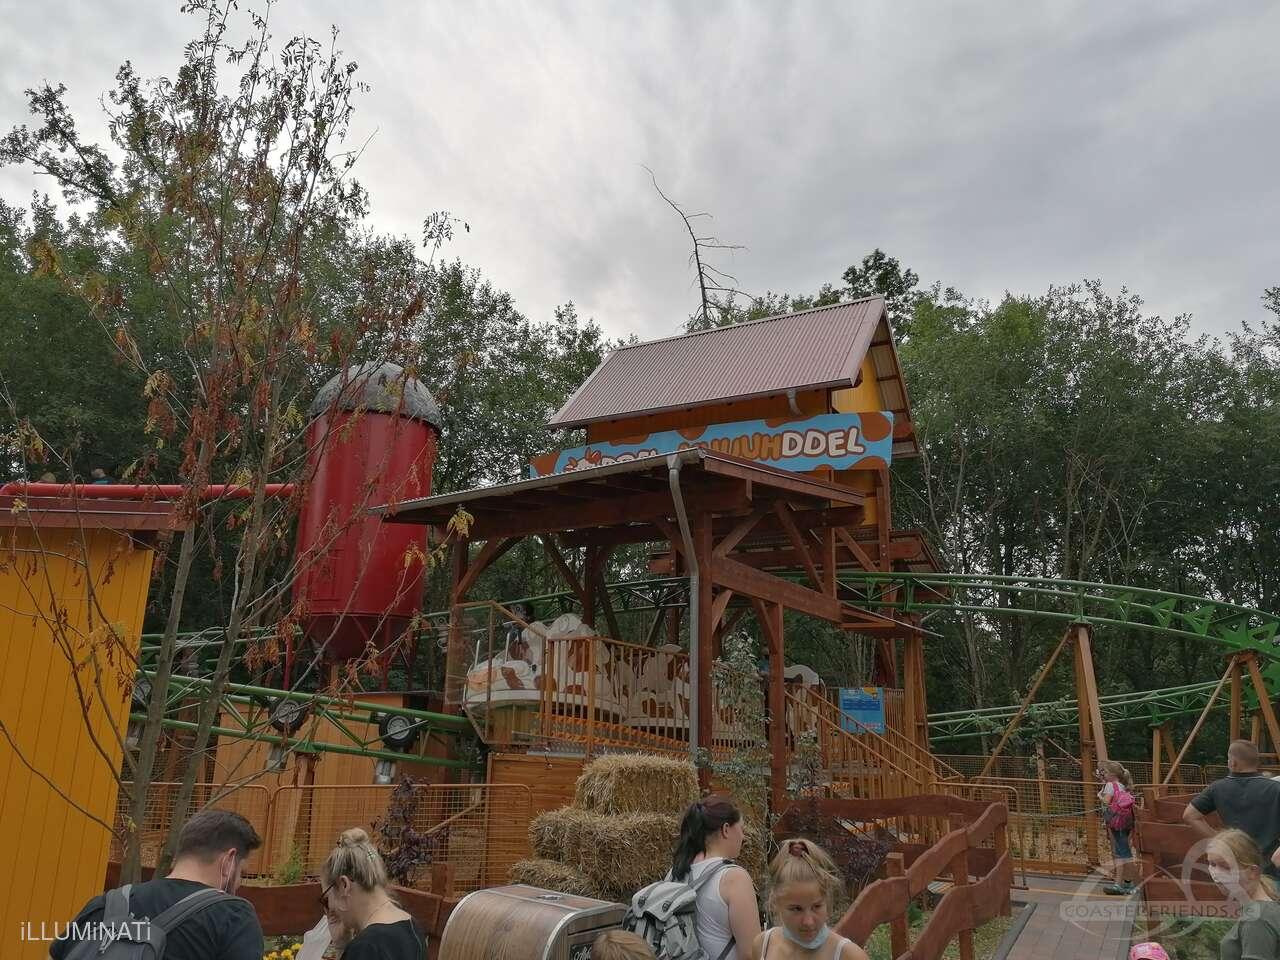 Kuhddel Muuuhddel im Park Taunus Wunderland Impressionen